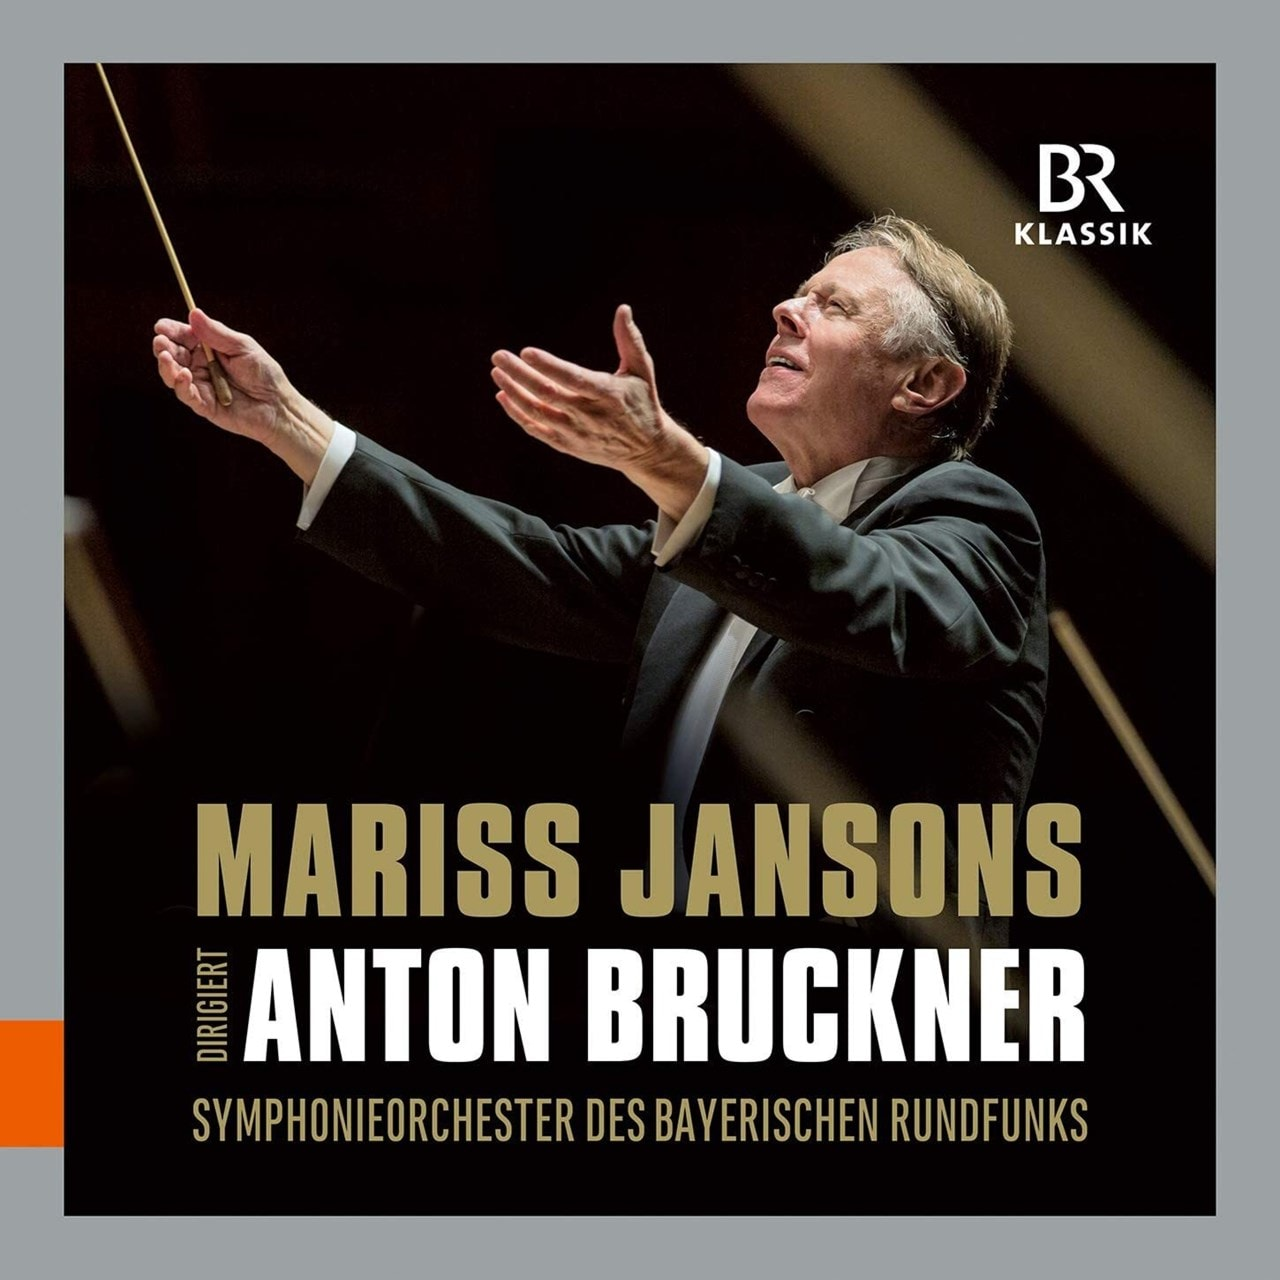 Mariss Jansons Dirigiert Anton Bruckner - 1